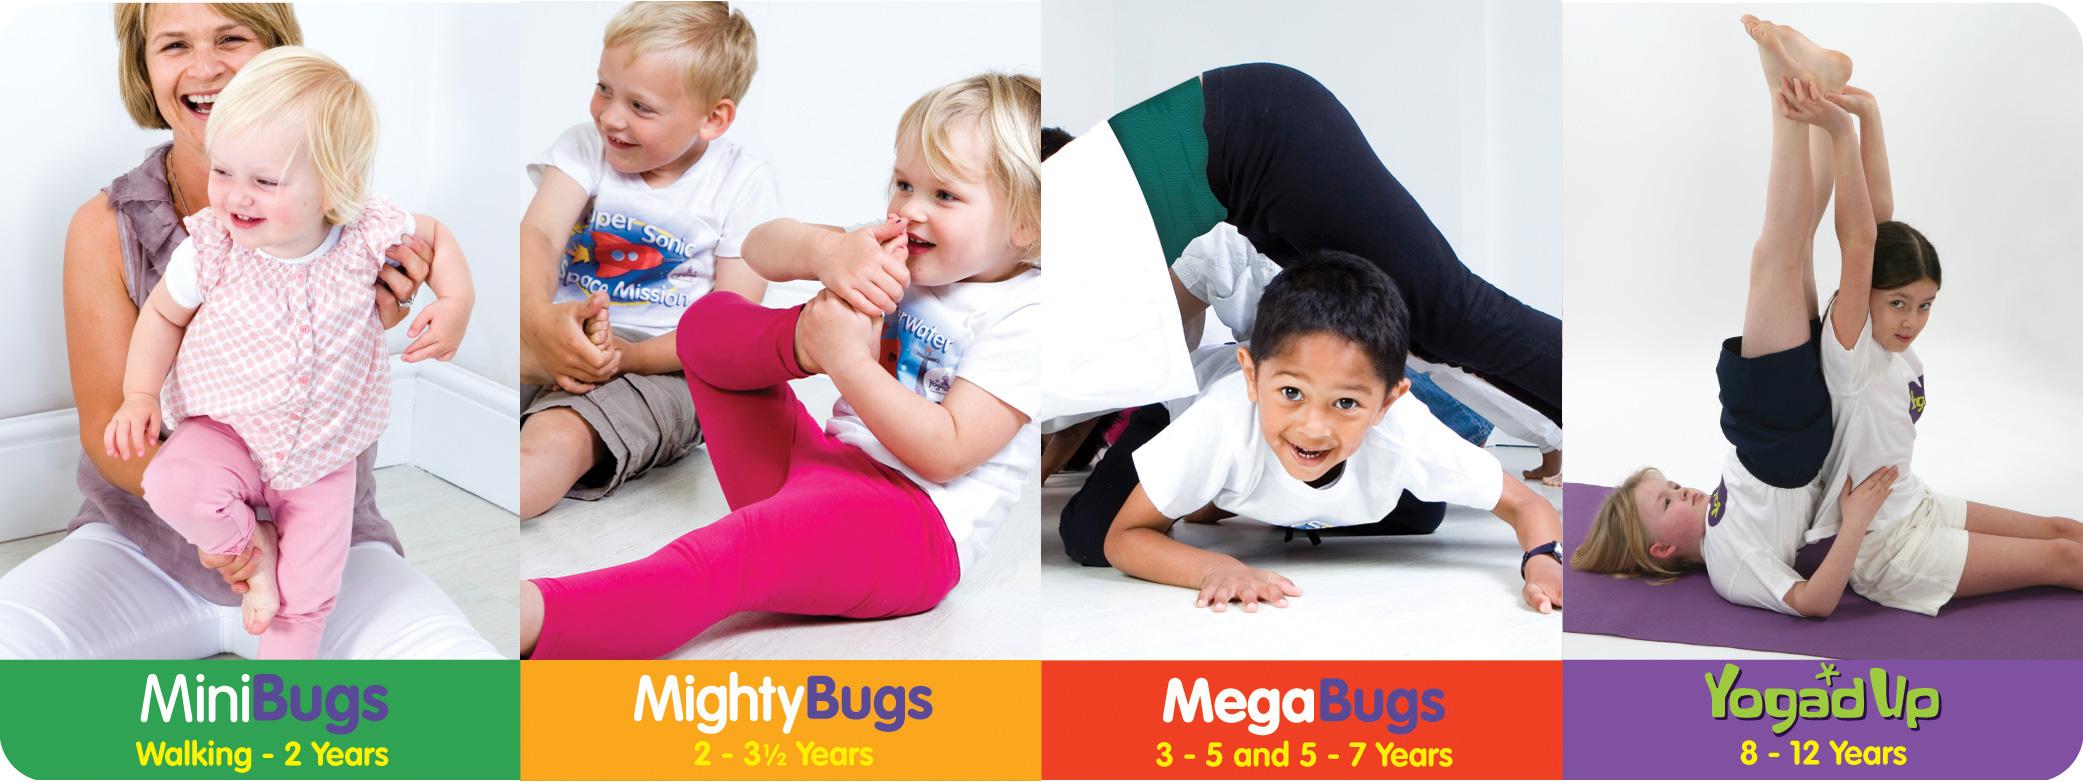 MiniBugs and MightyBugs